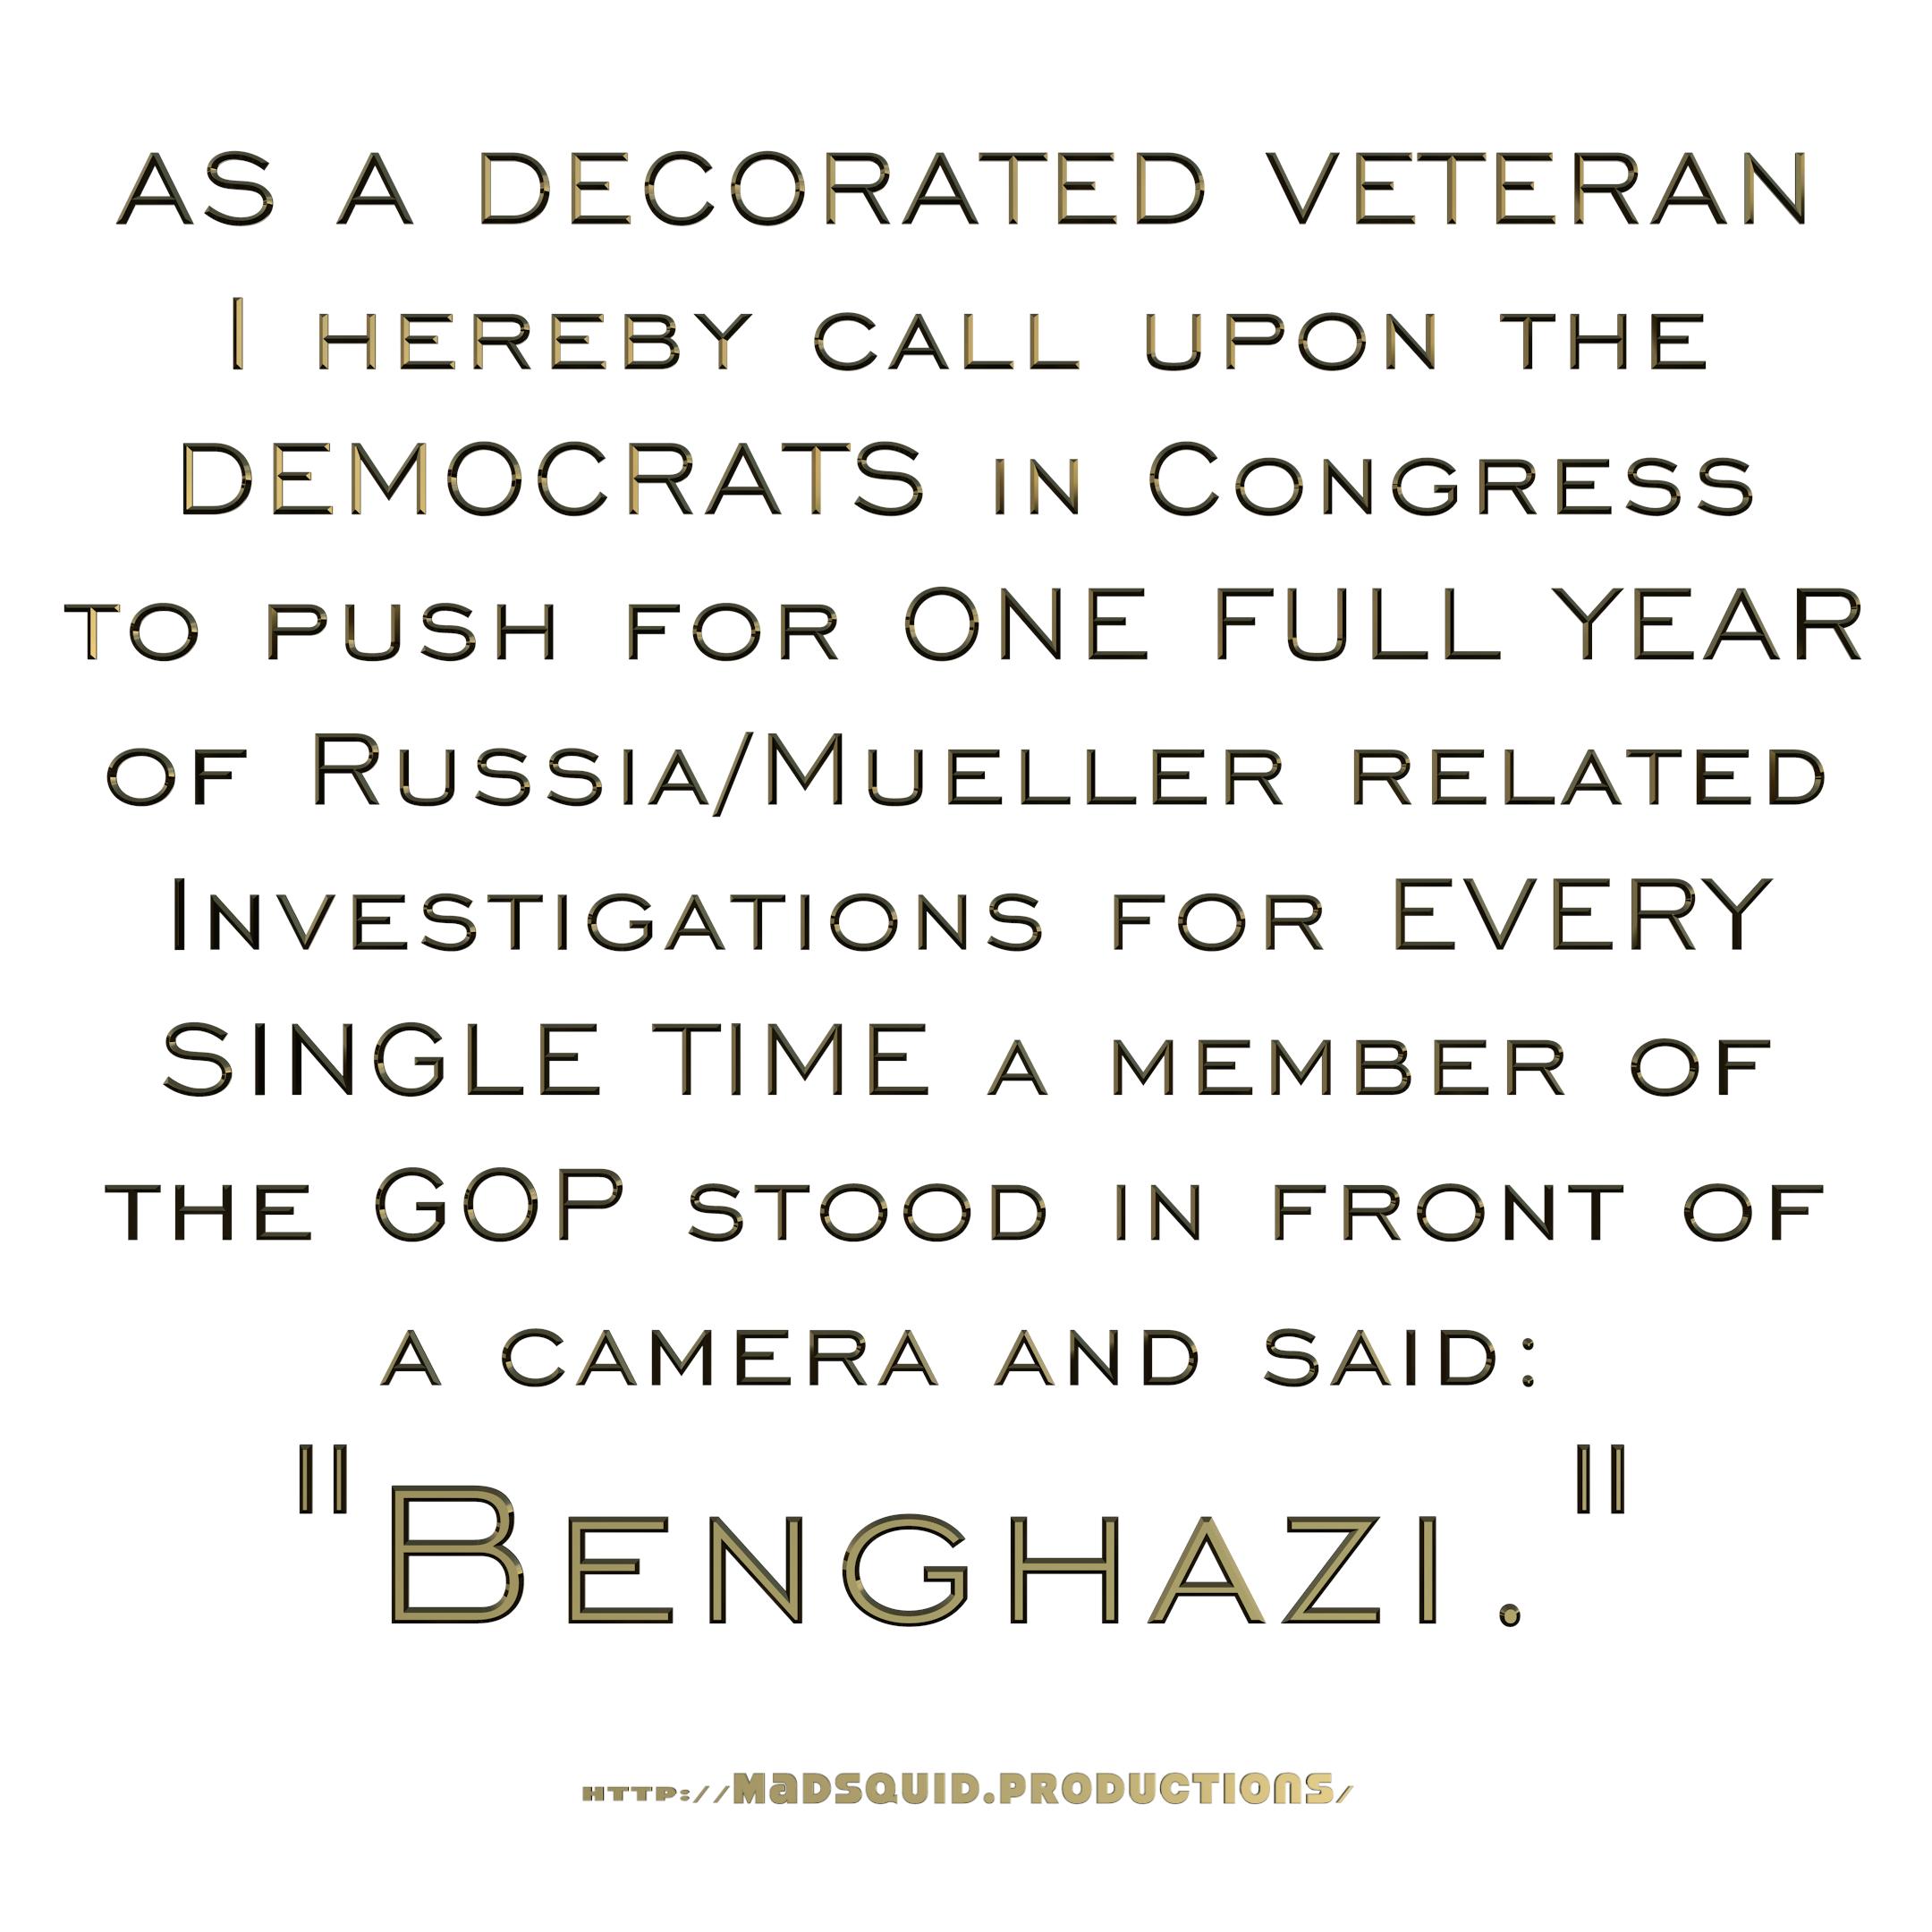 Benghazi Russia Mueller Investigations 2.png